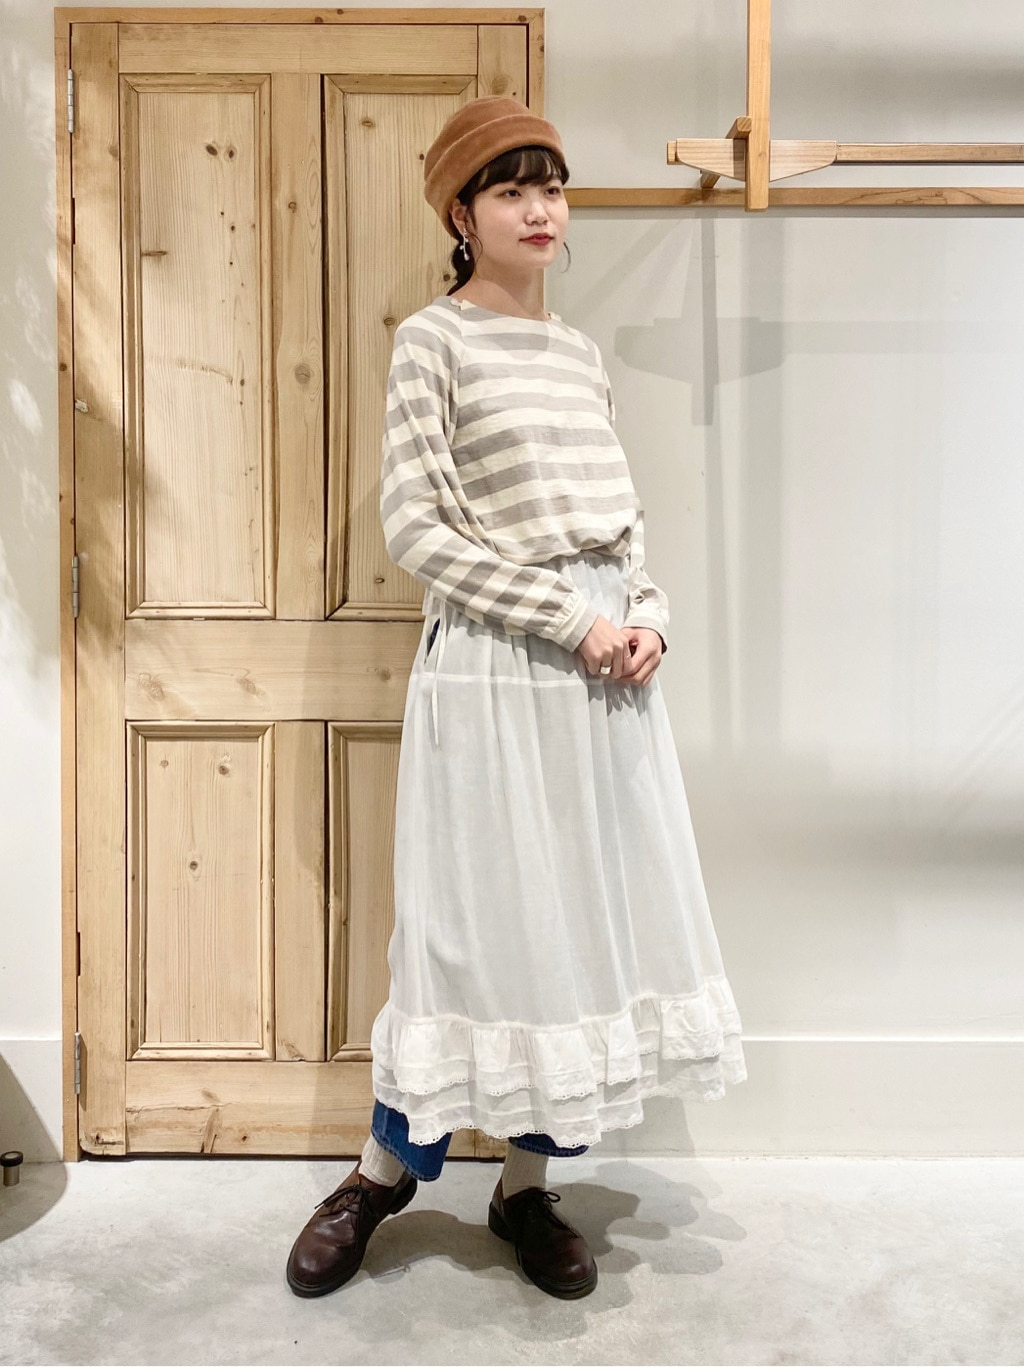 Malle chambre de charme 調布パルコ 身長:167cm 2020.11.13